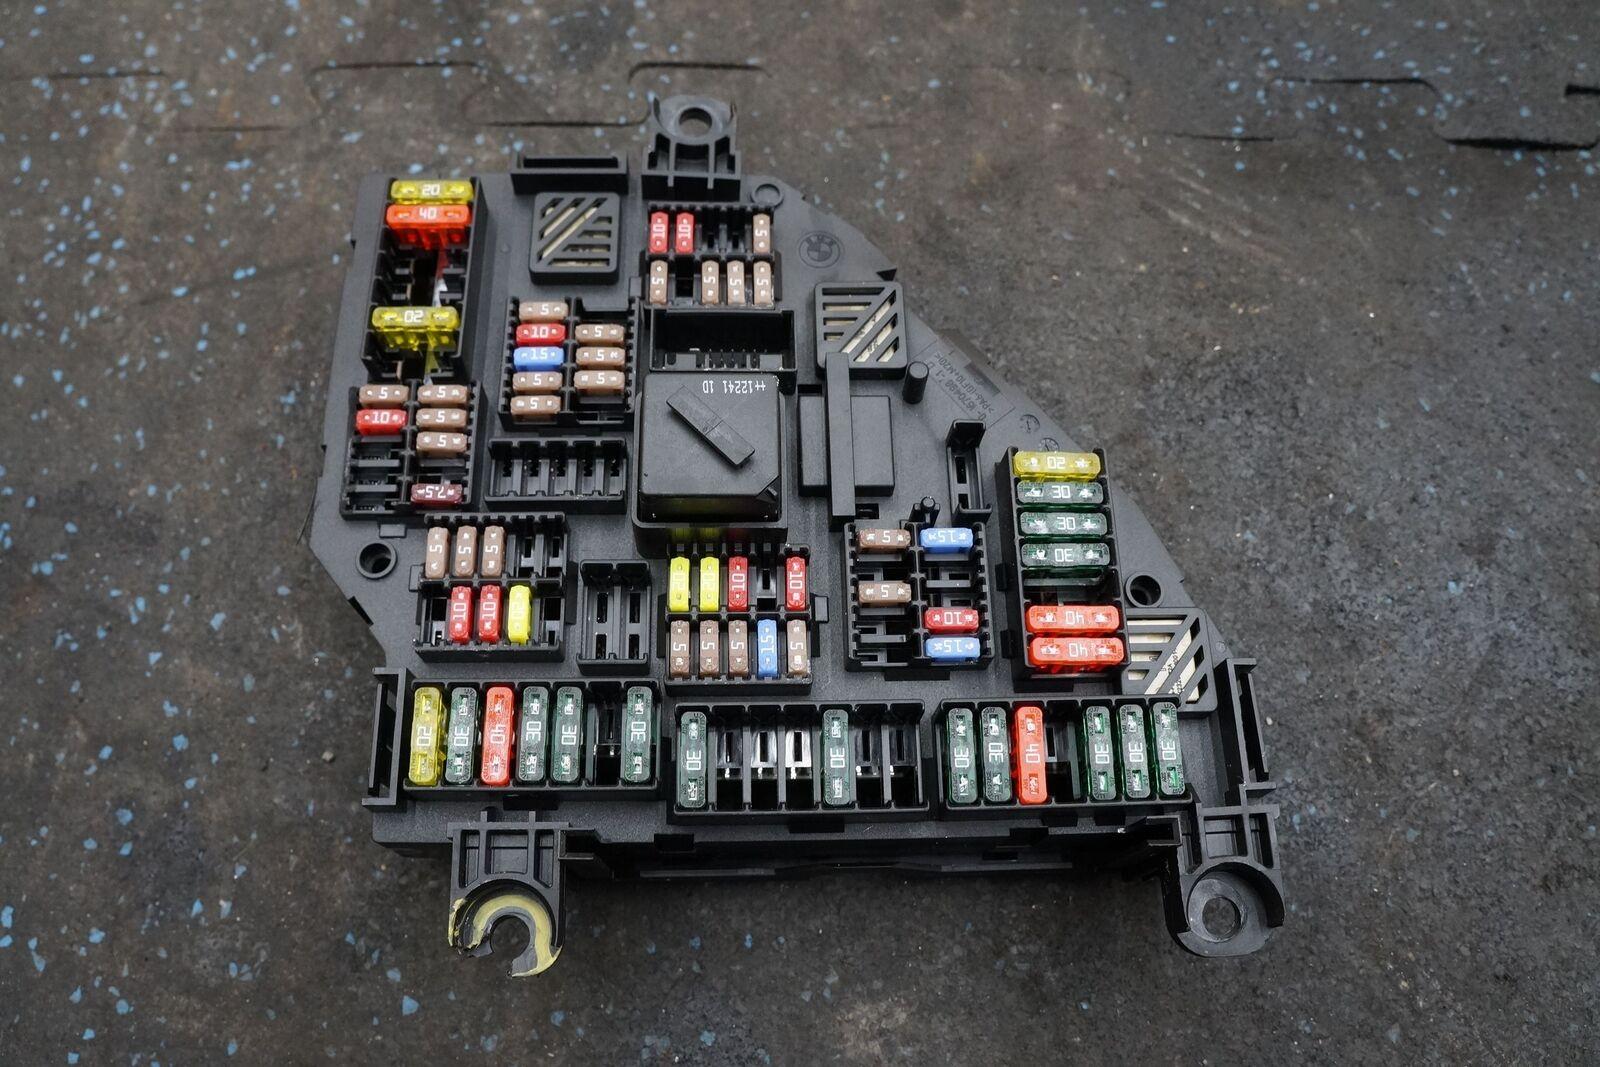 2013 M5 Fuse Box Just Wiring Diagram Schematic 2008 Mercedes C300 Location Rear Power Distribution Block 61149264923 Bmw F10 Rims